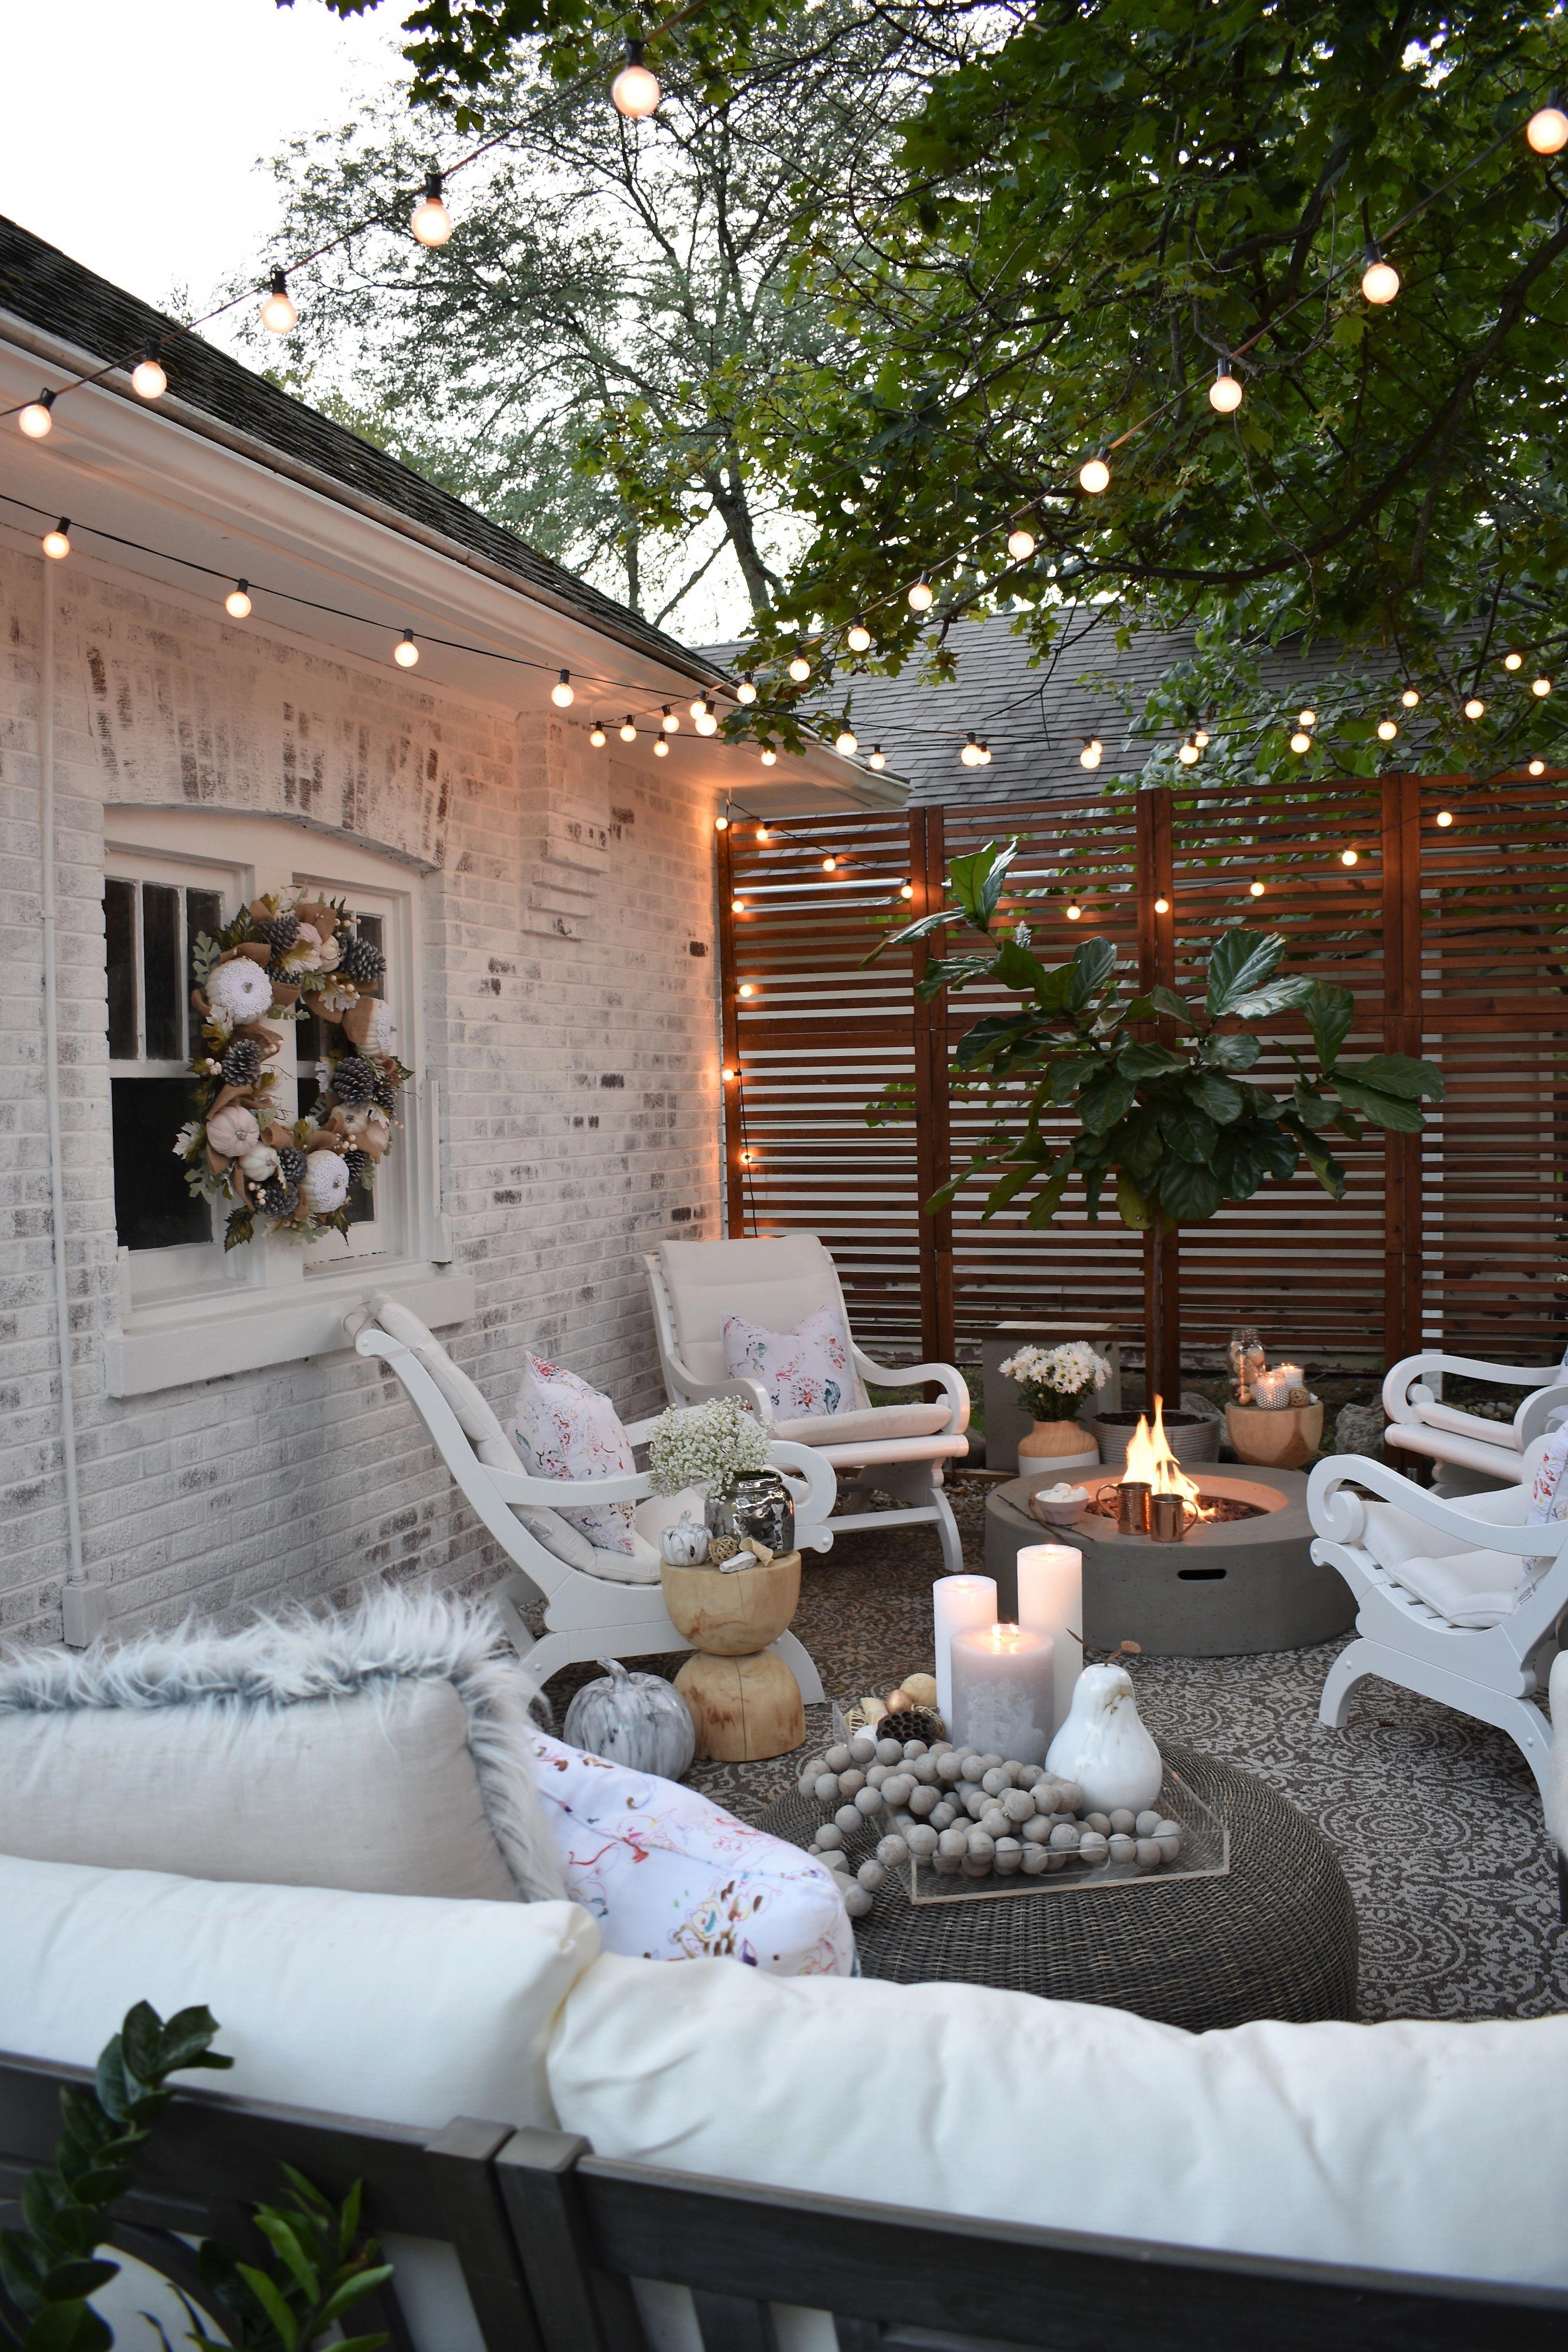 Traditional Wooden Pavilion Green Acres Outdoor Living Violetta Outdoor Patio Decor Patio Design Patio Decor